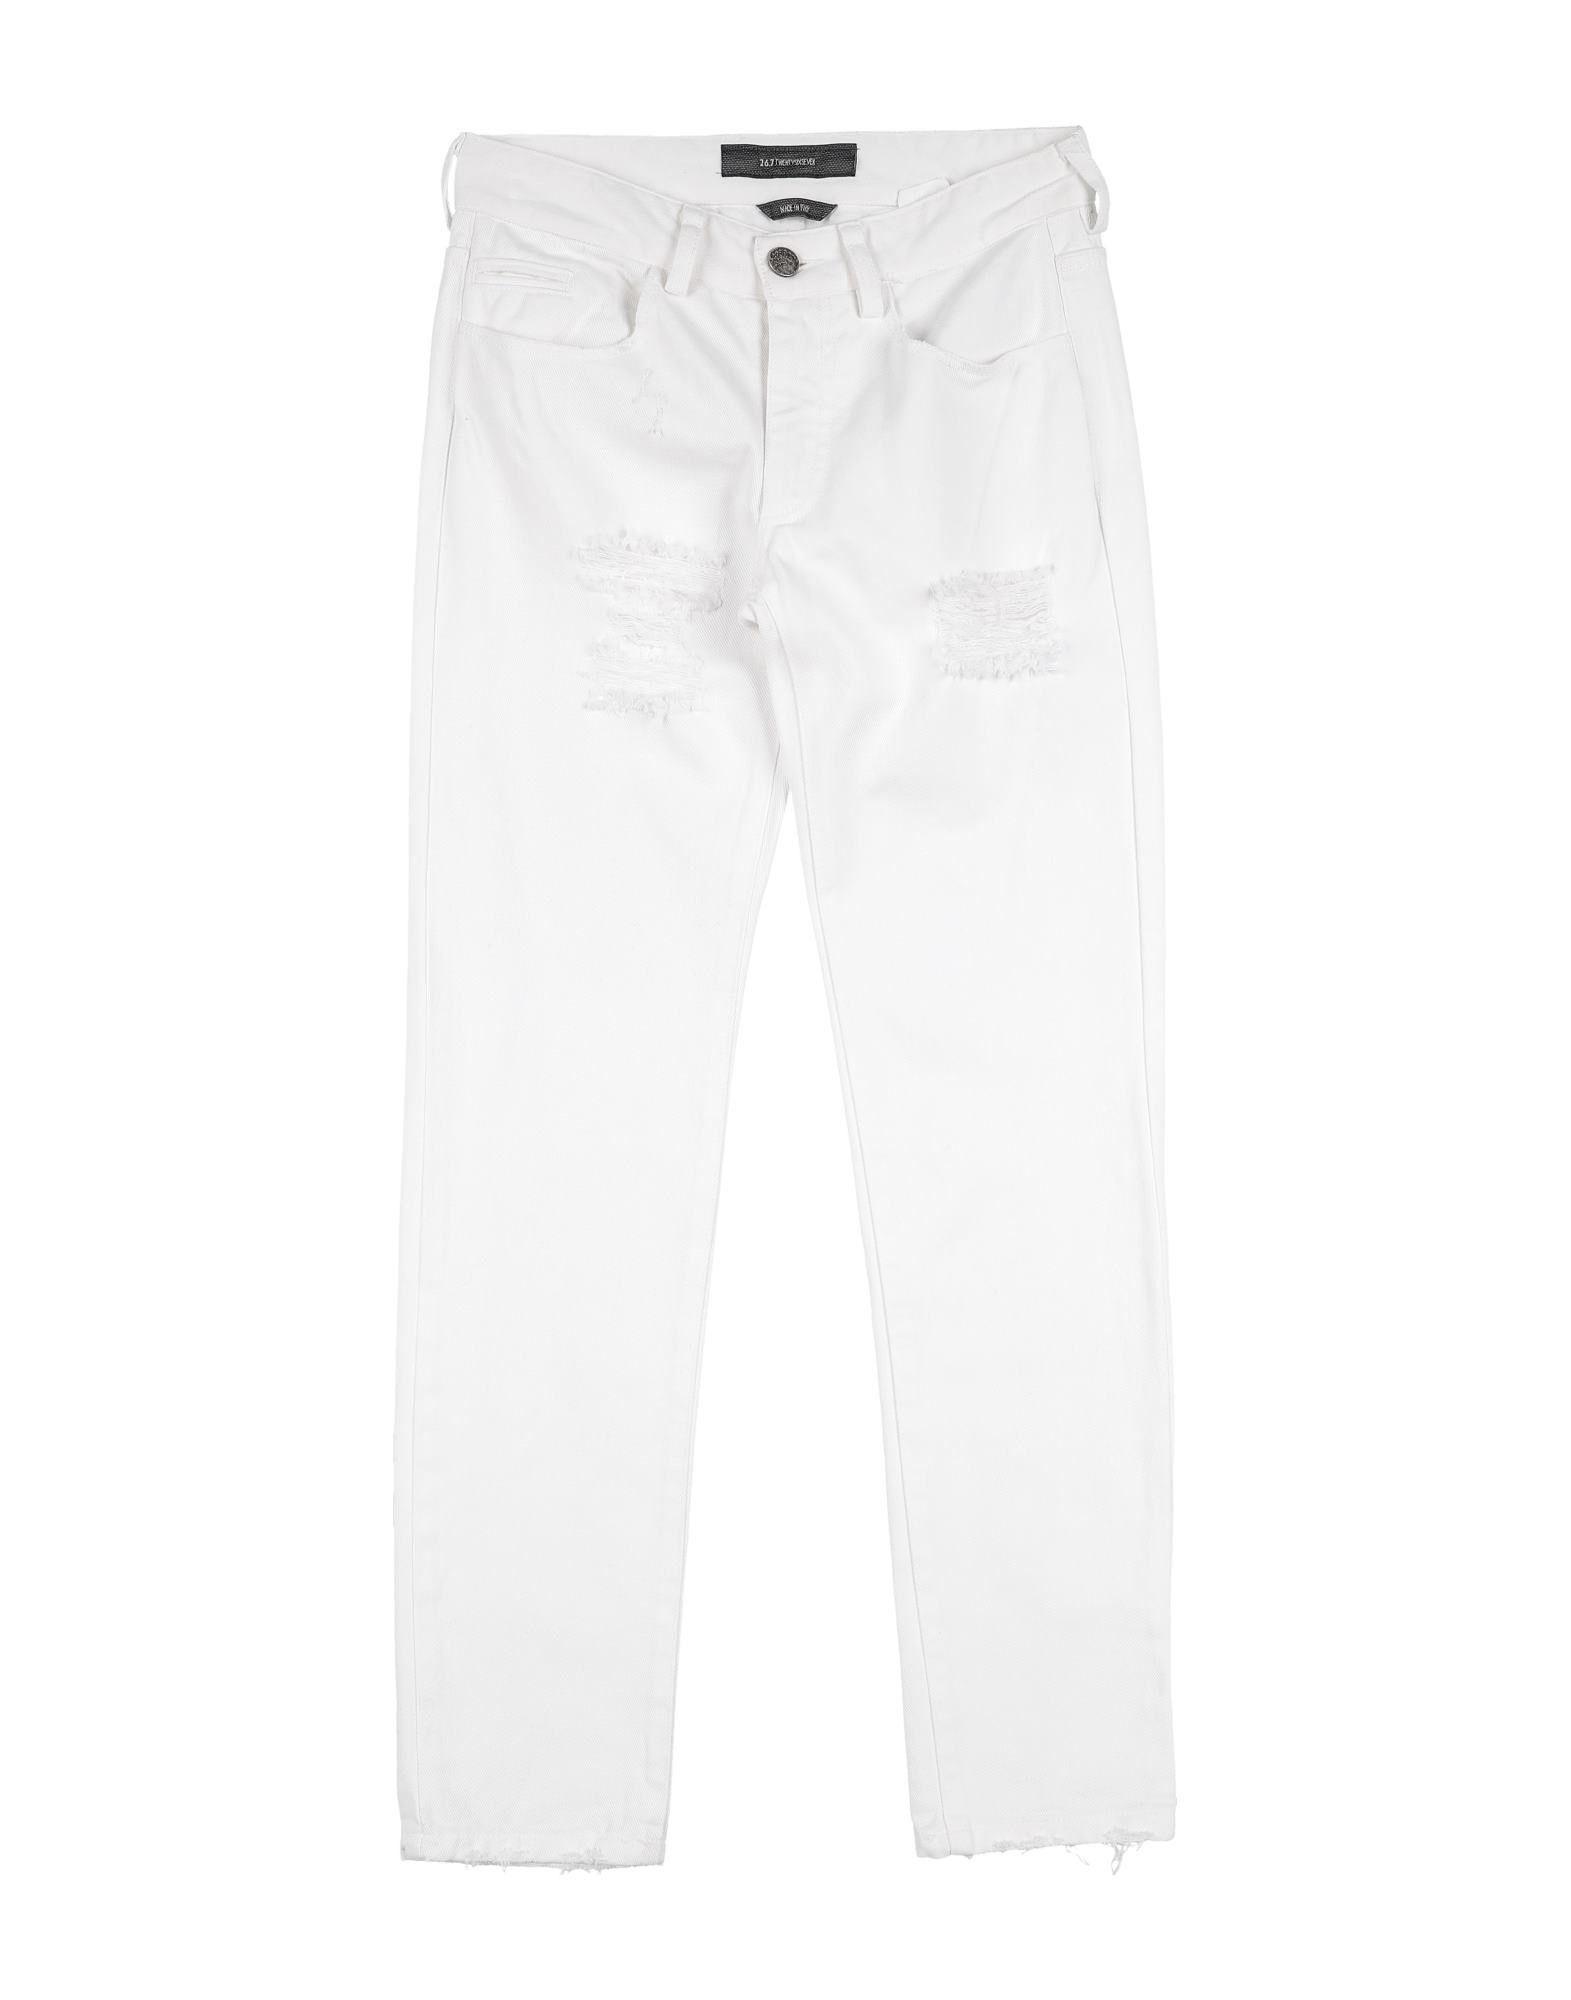 26.7 Twentysixseven Kids' Jeans In White